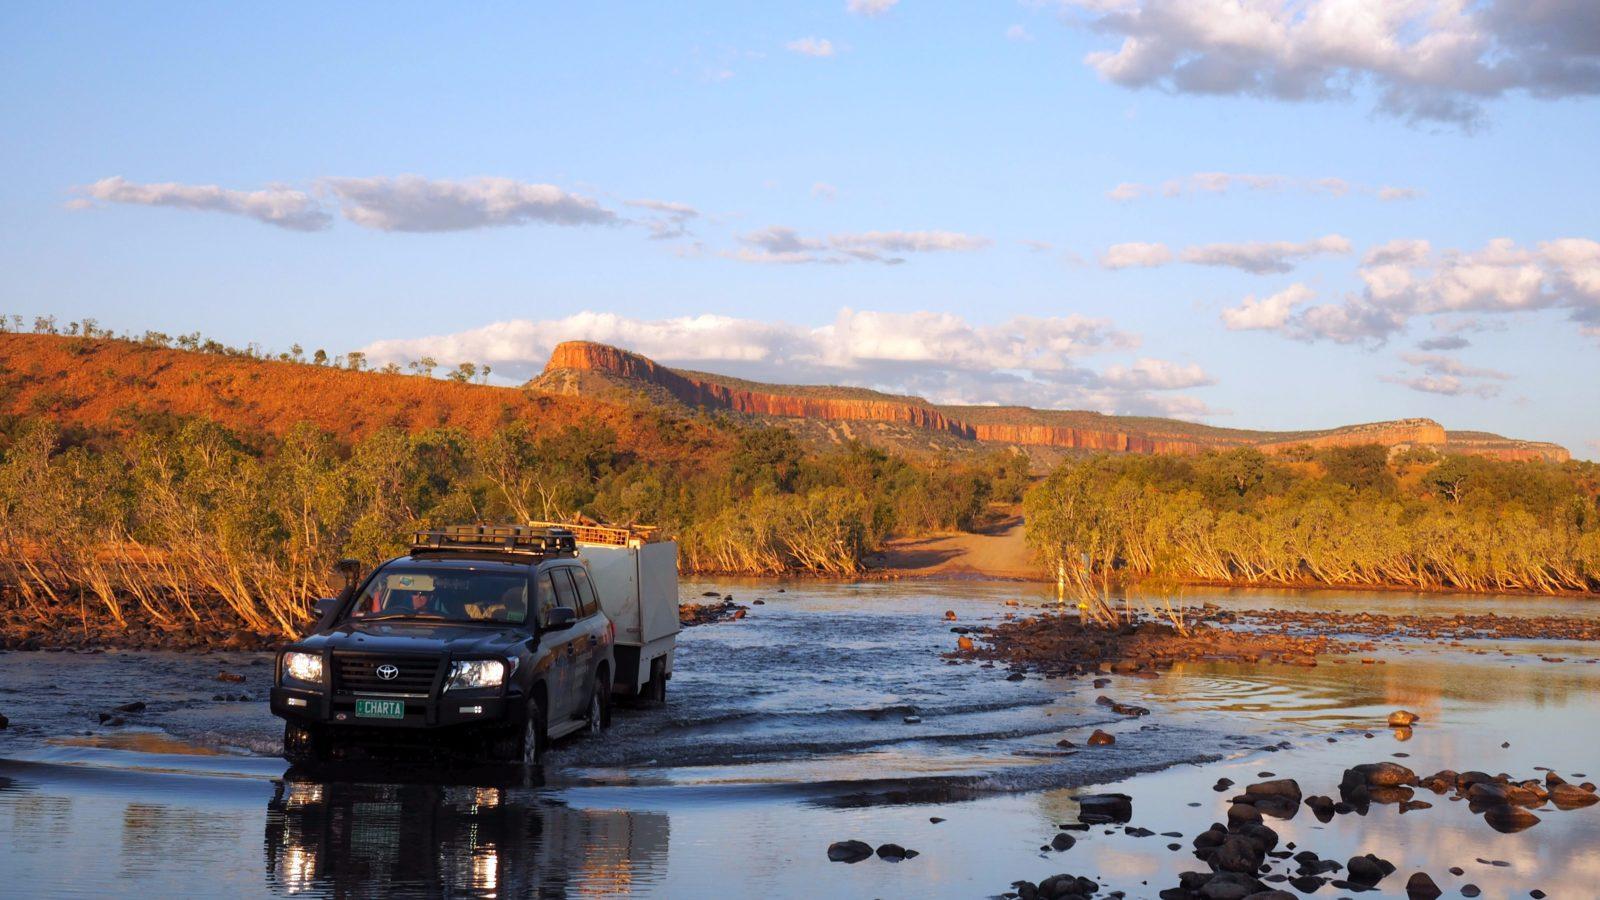 Charter North Vehicle at Pentecoast River Crossing- the Kimberley